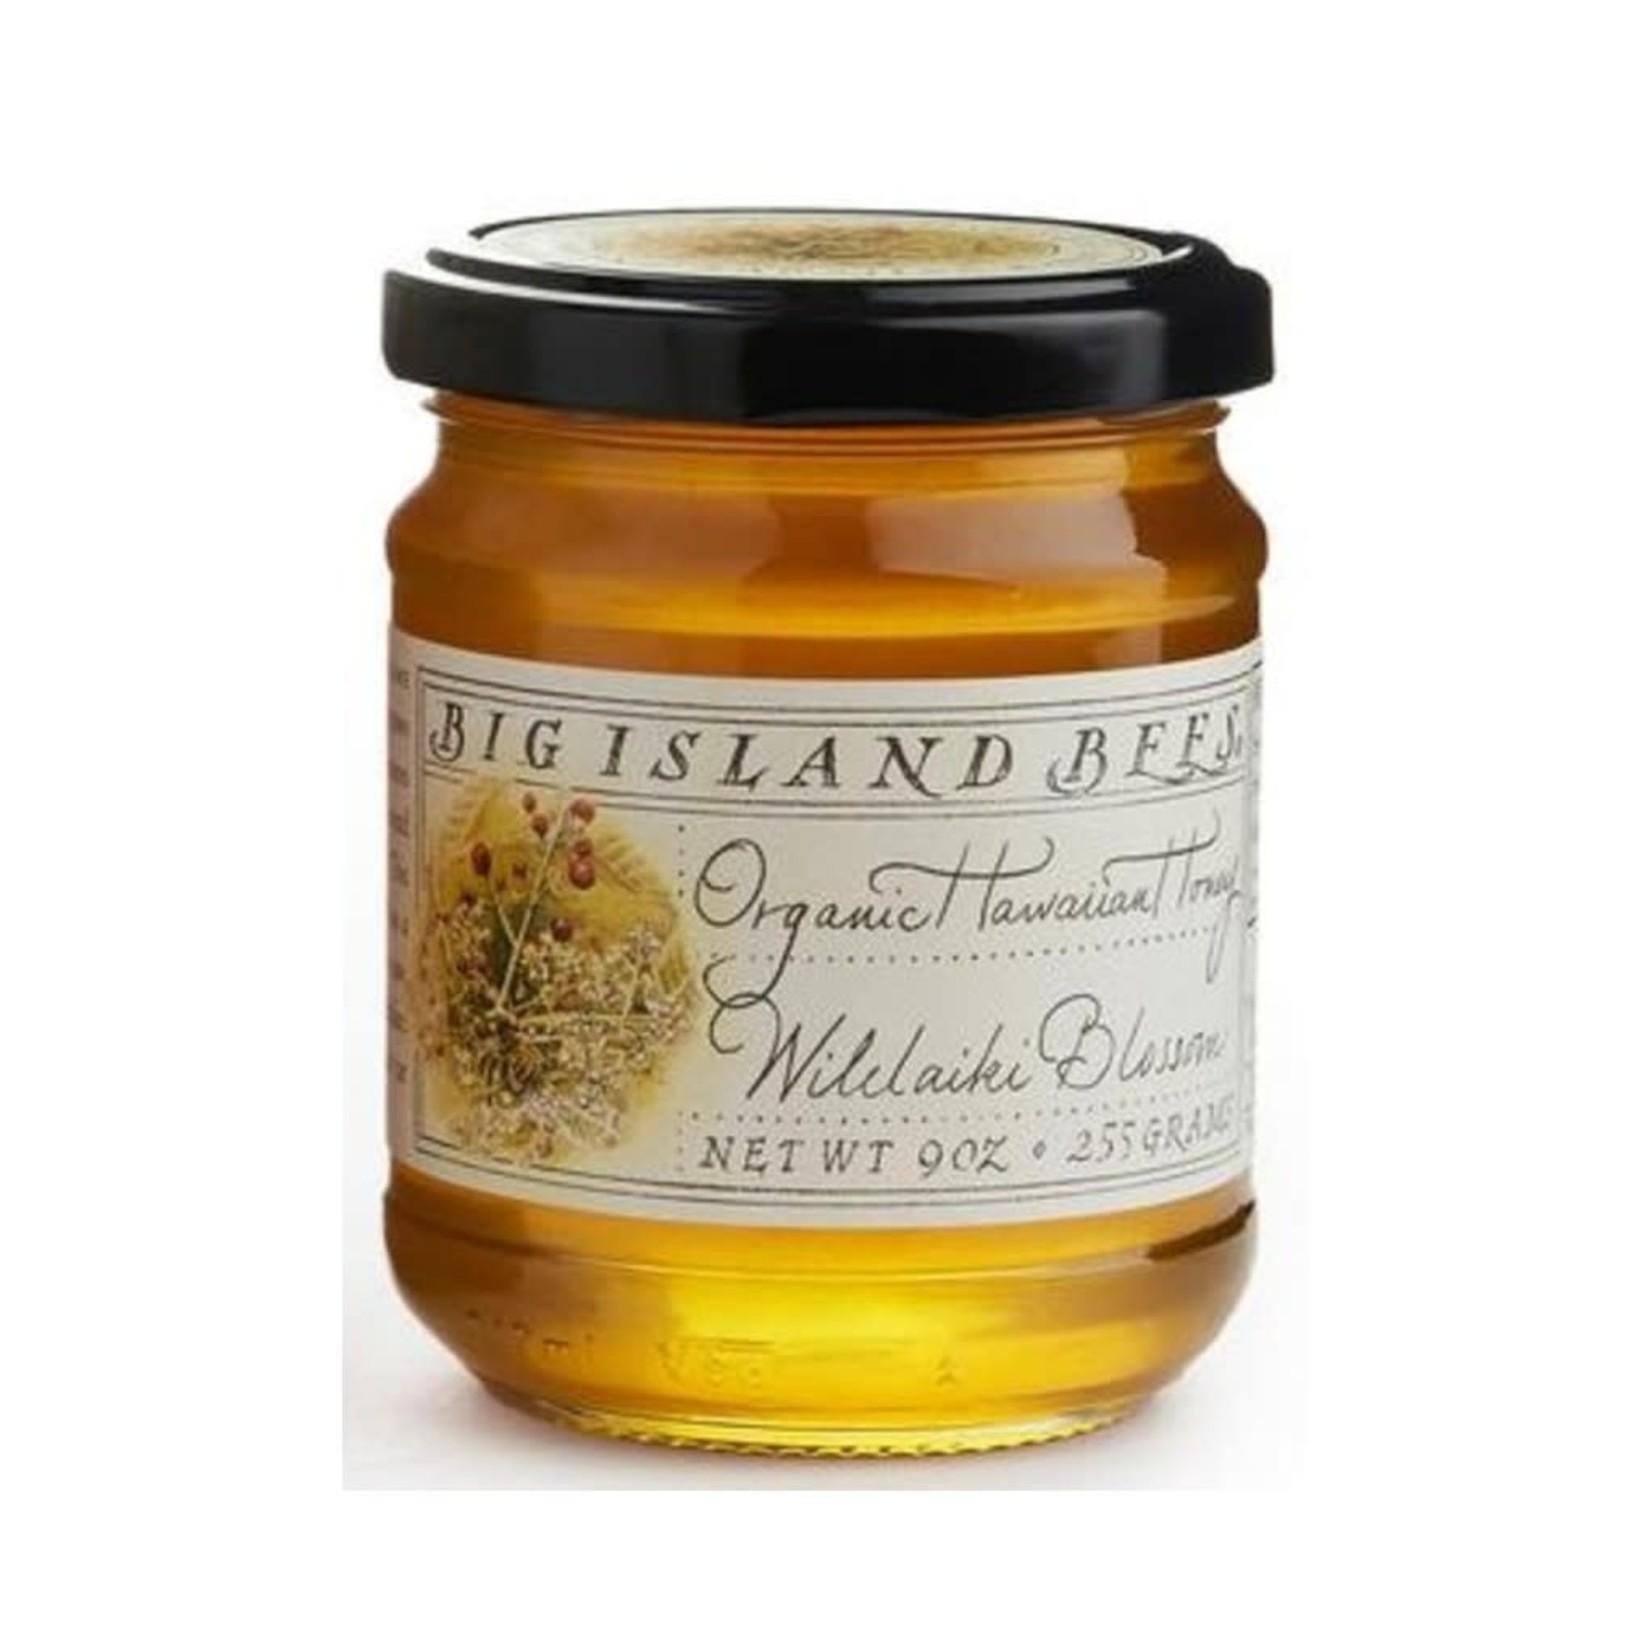 Big Island Bees Organic Wilelaiki Honey 9 oz